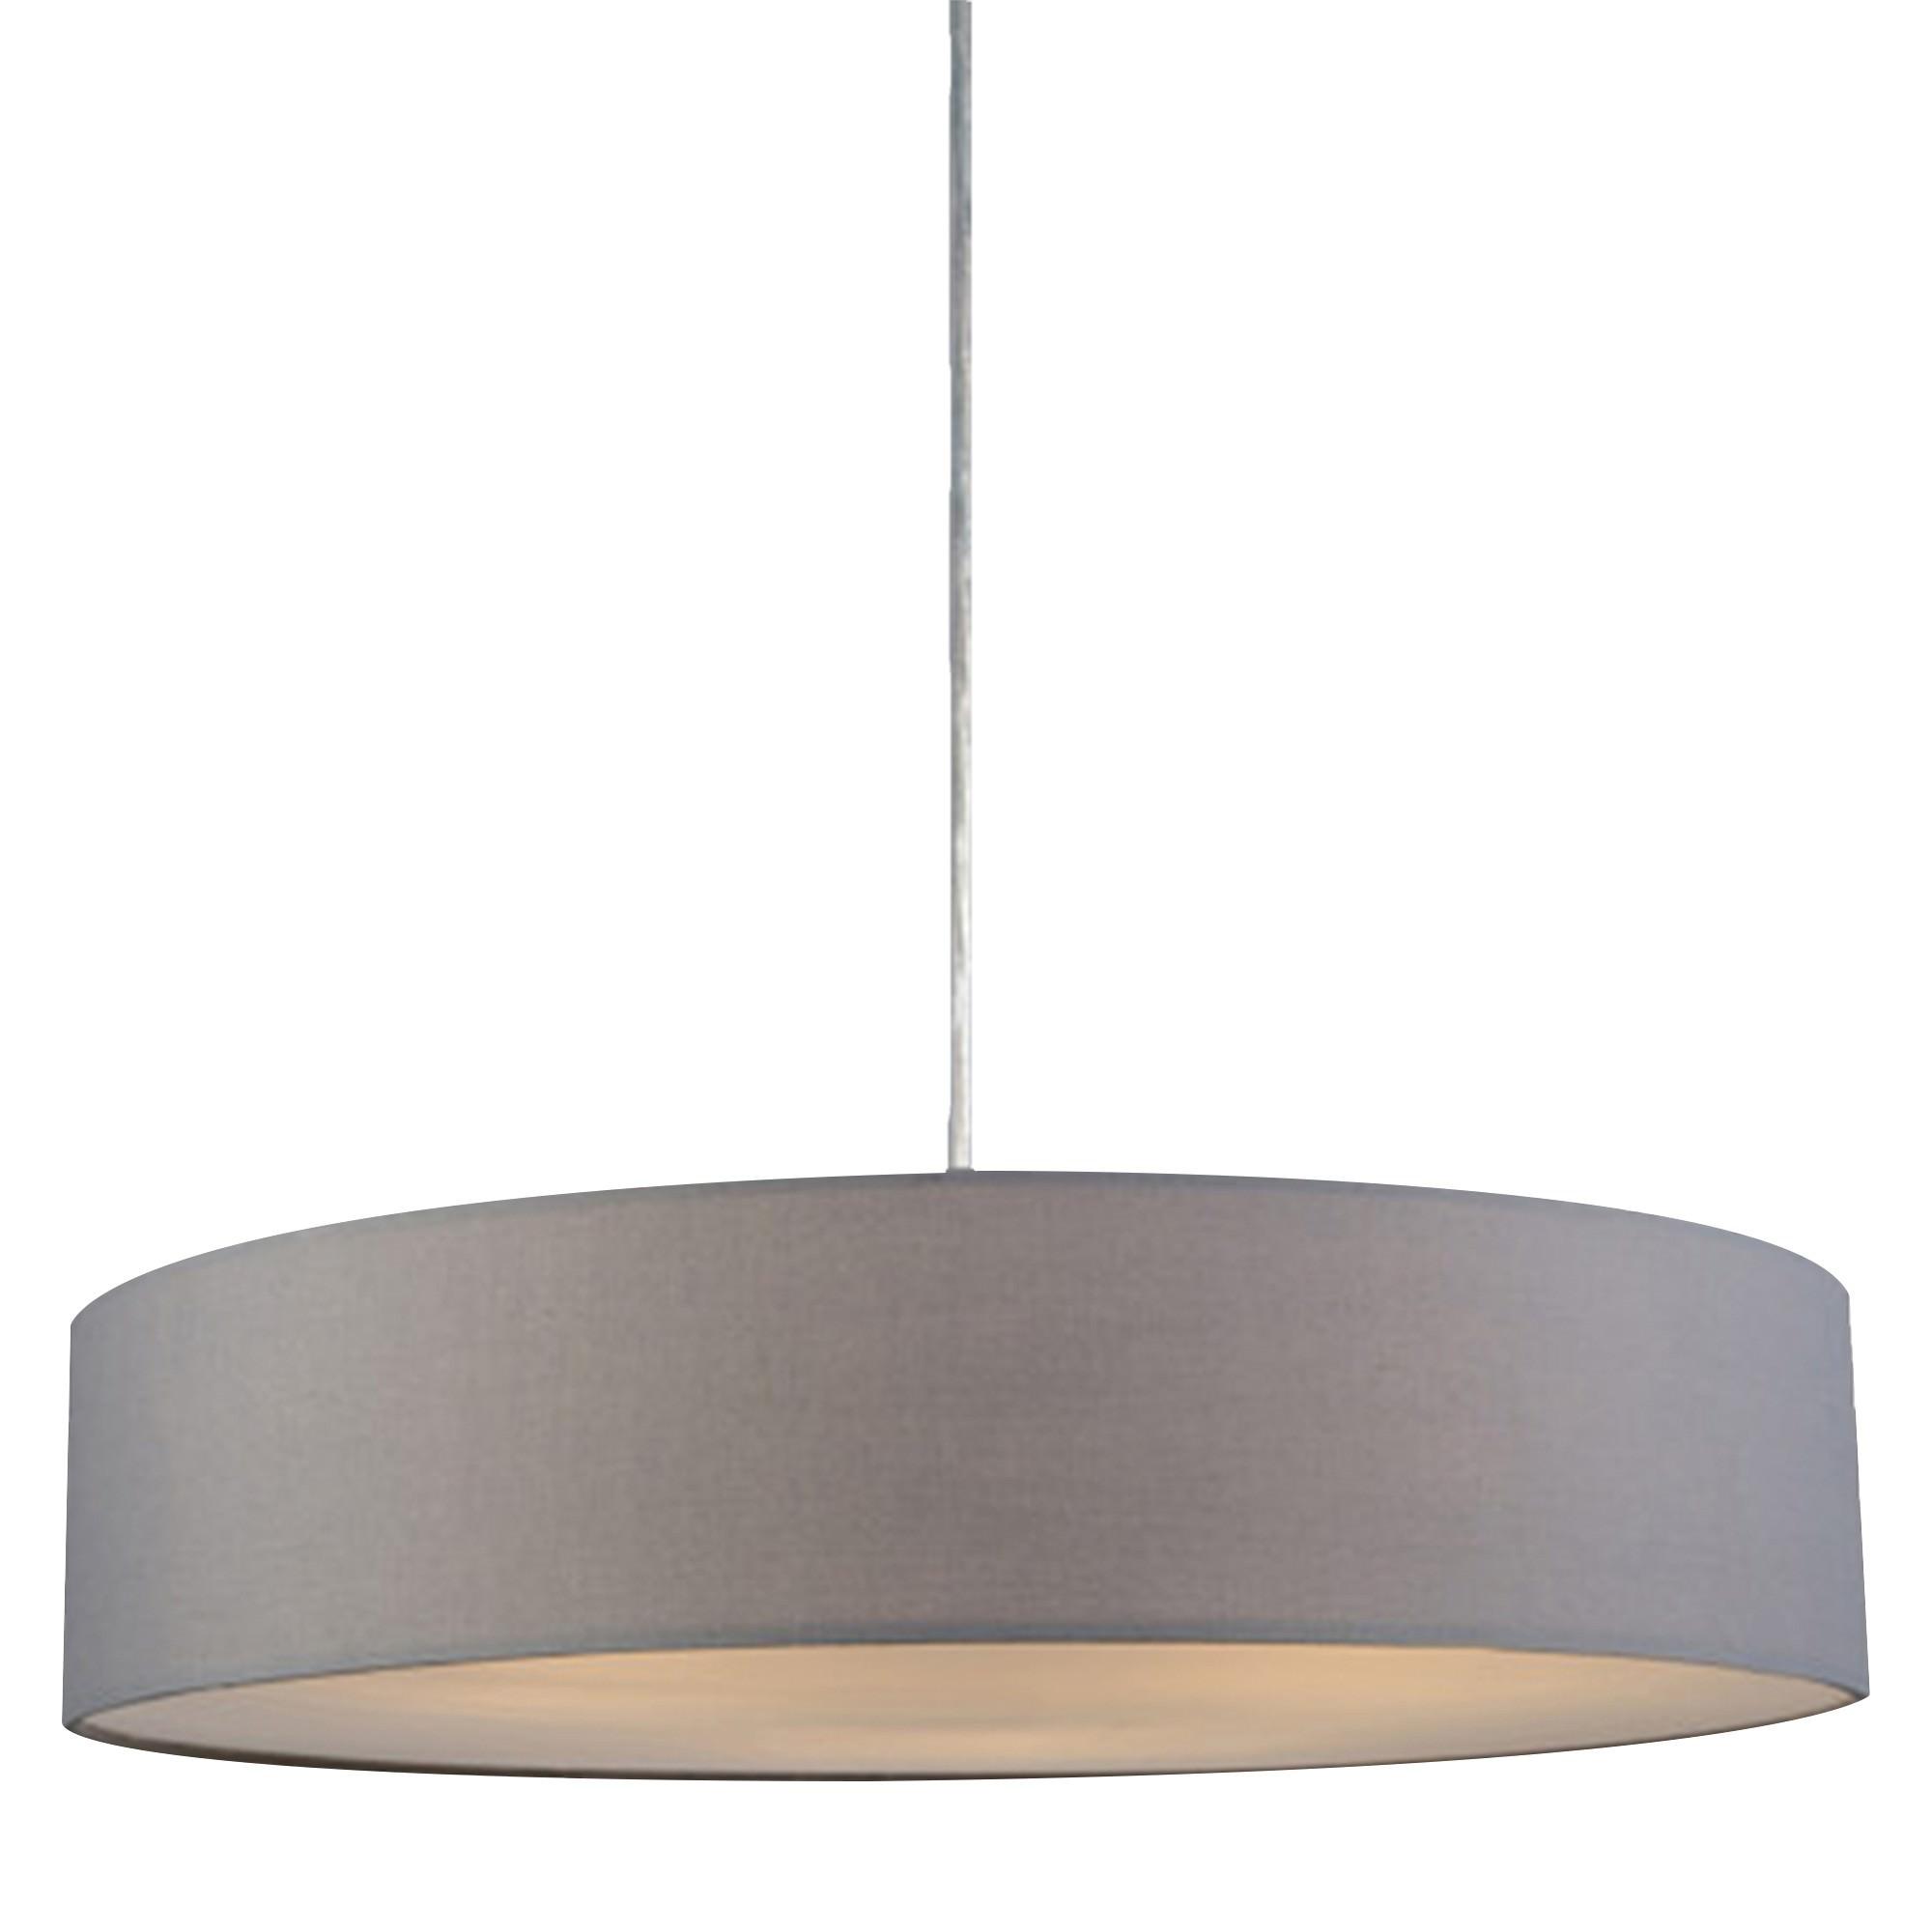 Mara Fabric Drum Pendant Light, Grey